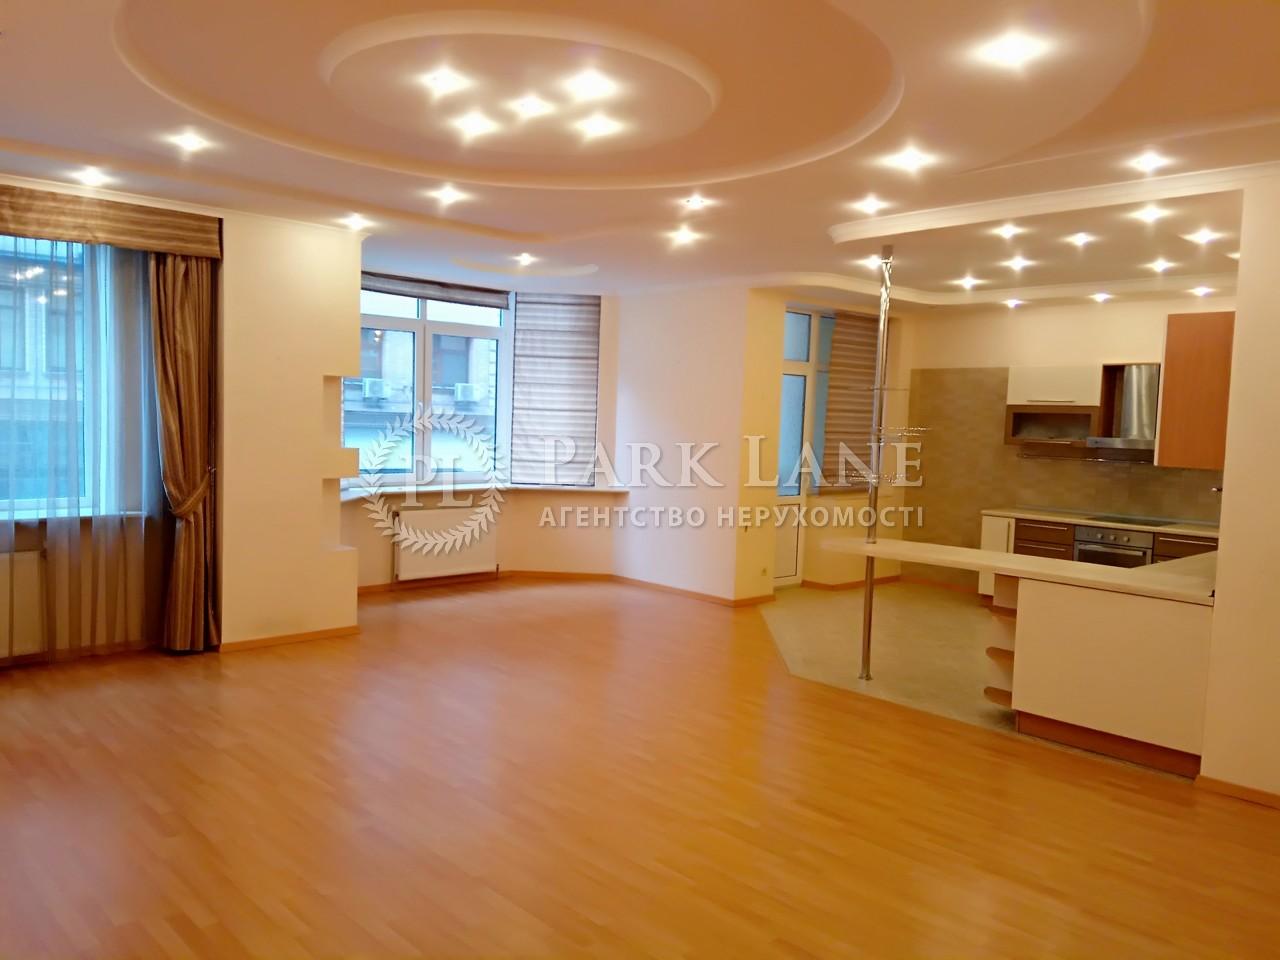 Квартира ул. Павловская, 17, Киев, R-26078 - Фото 5